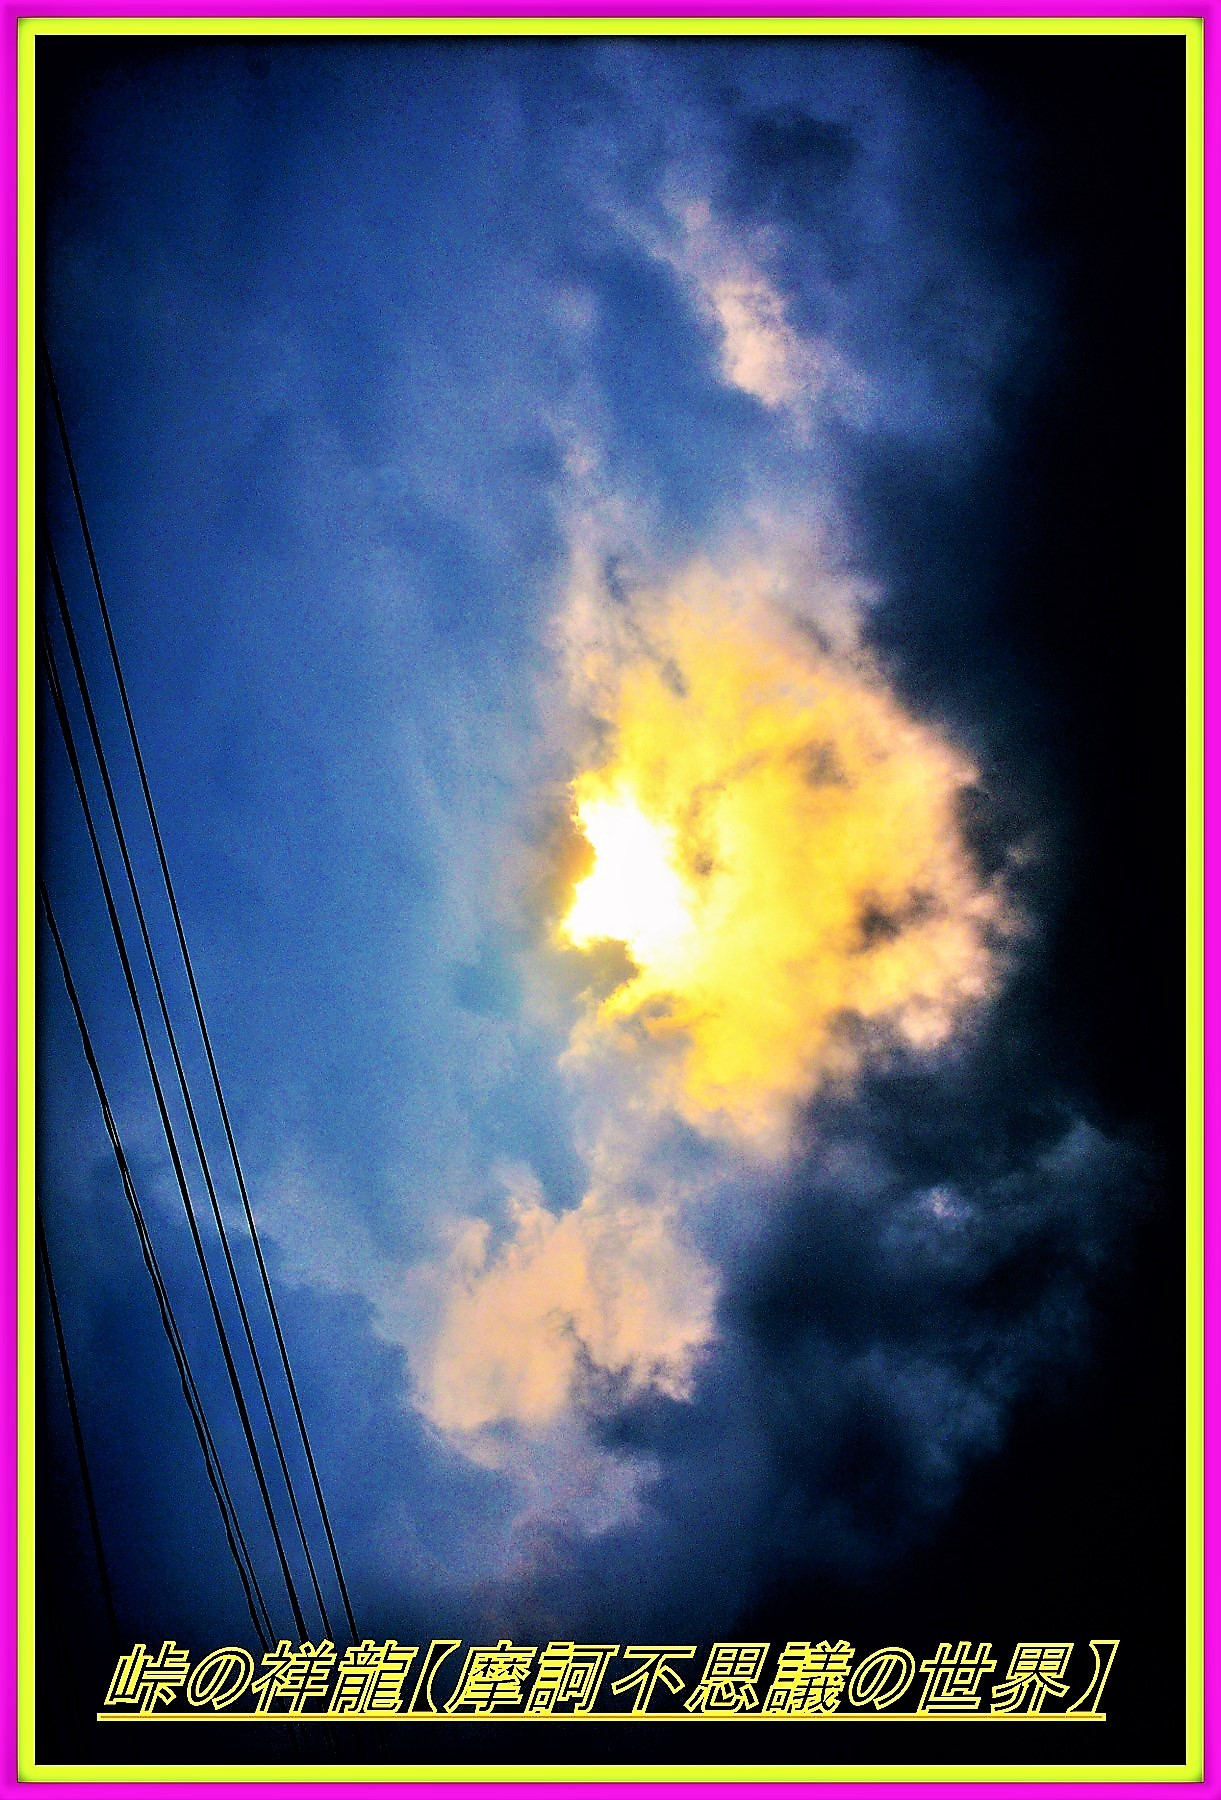 東京・天空に【精霊】出現❢❢